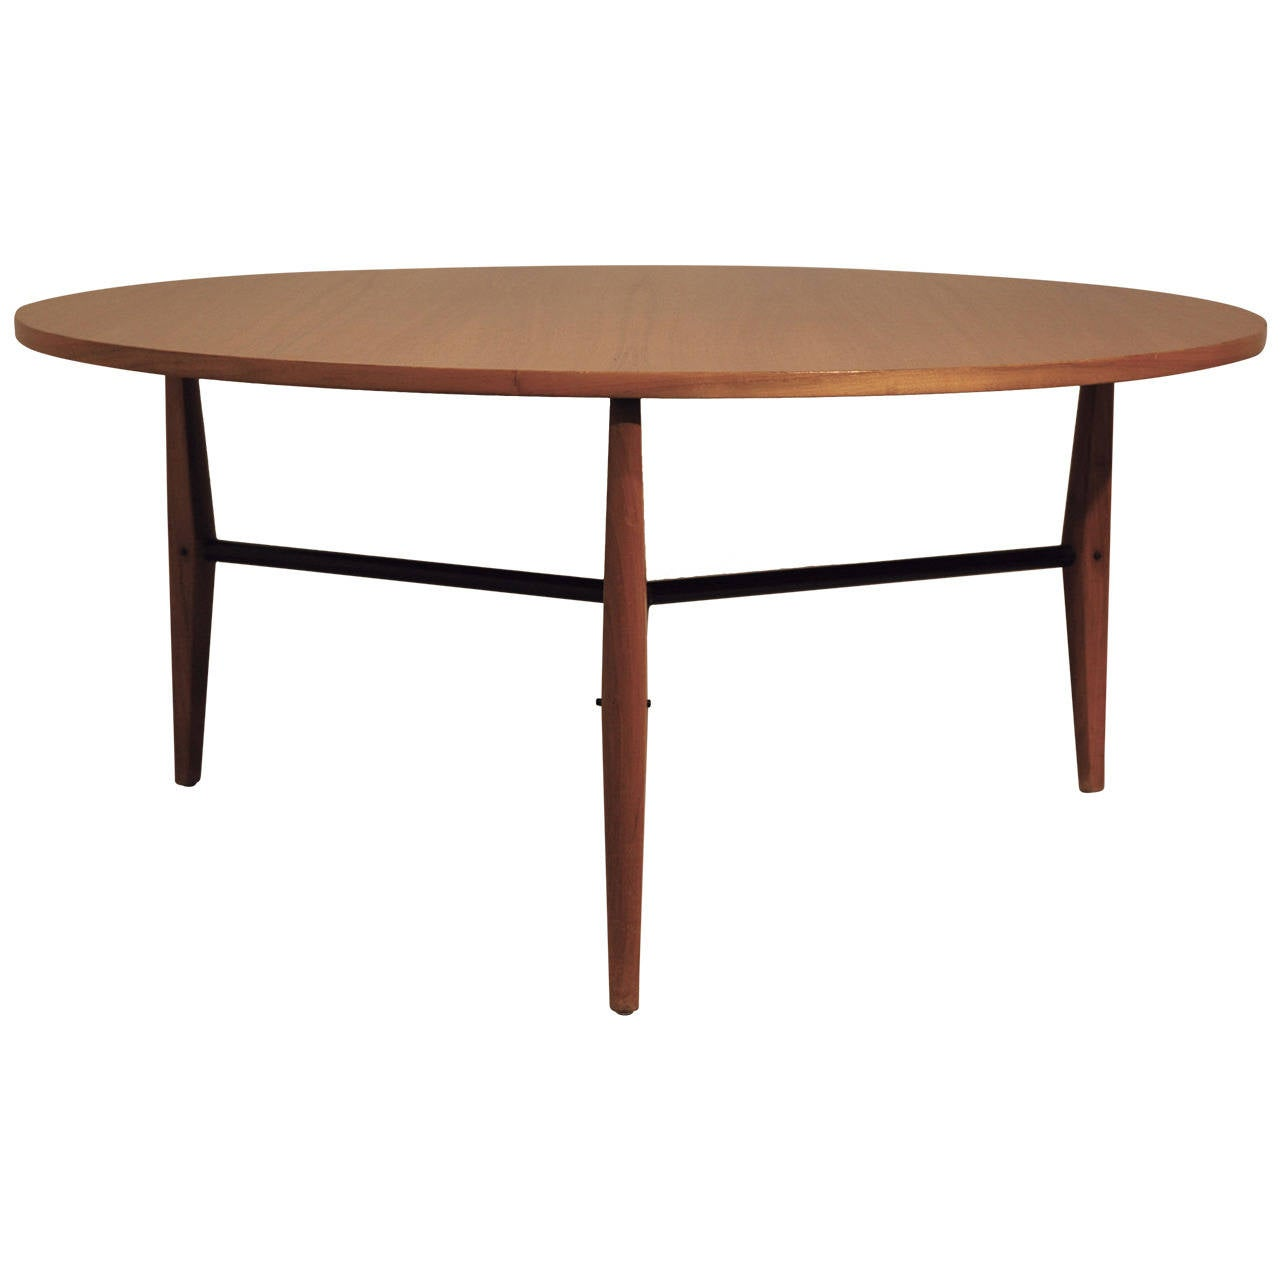 Coffee table 401 by harry bertoia fo knoll germany at 1stdibs - Bertoia coffee table ...